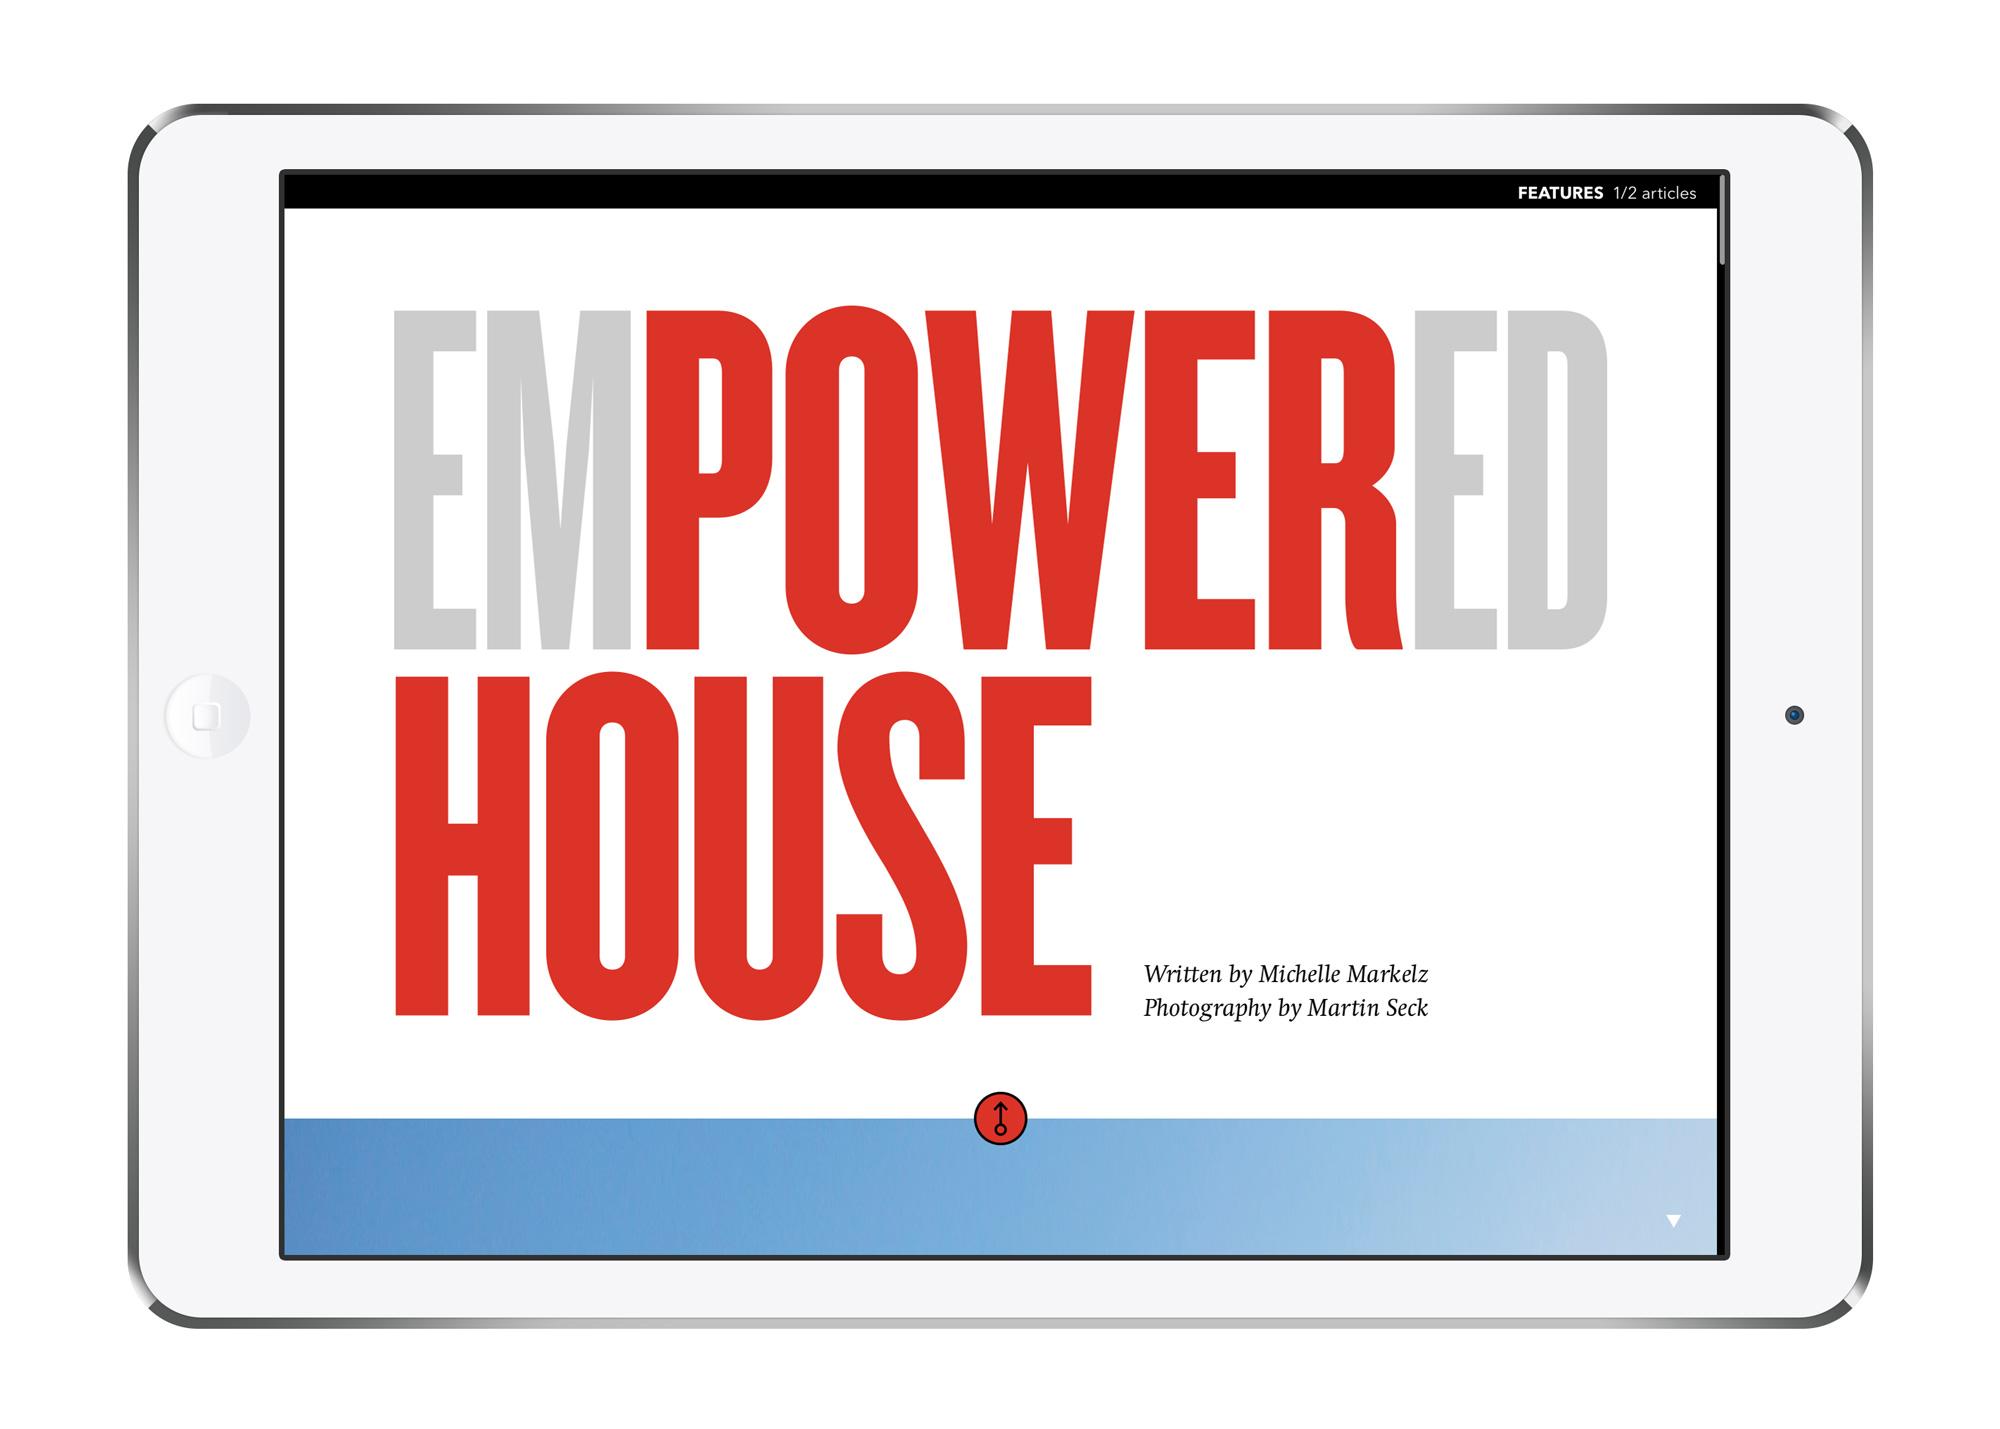 GBD_iPad_Feature-Empower-1.jpg